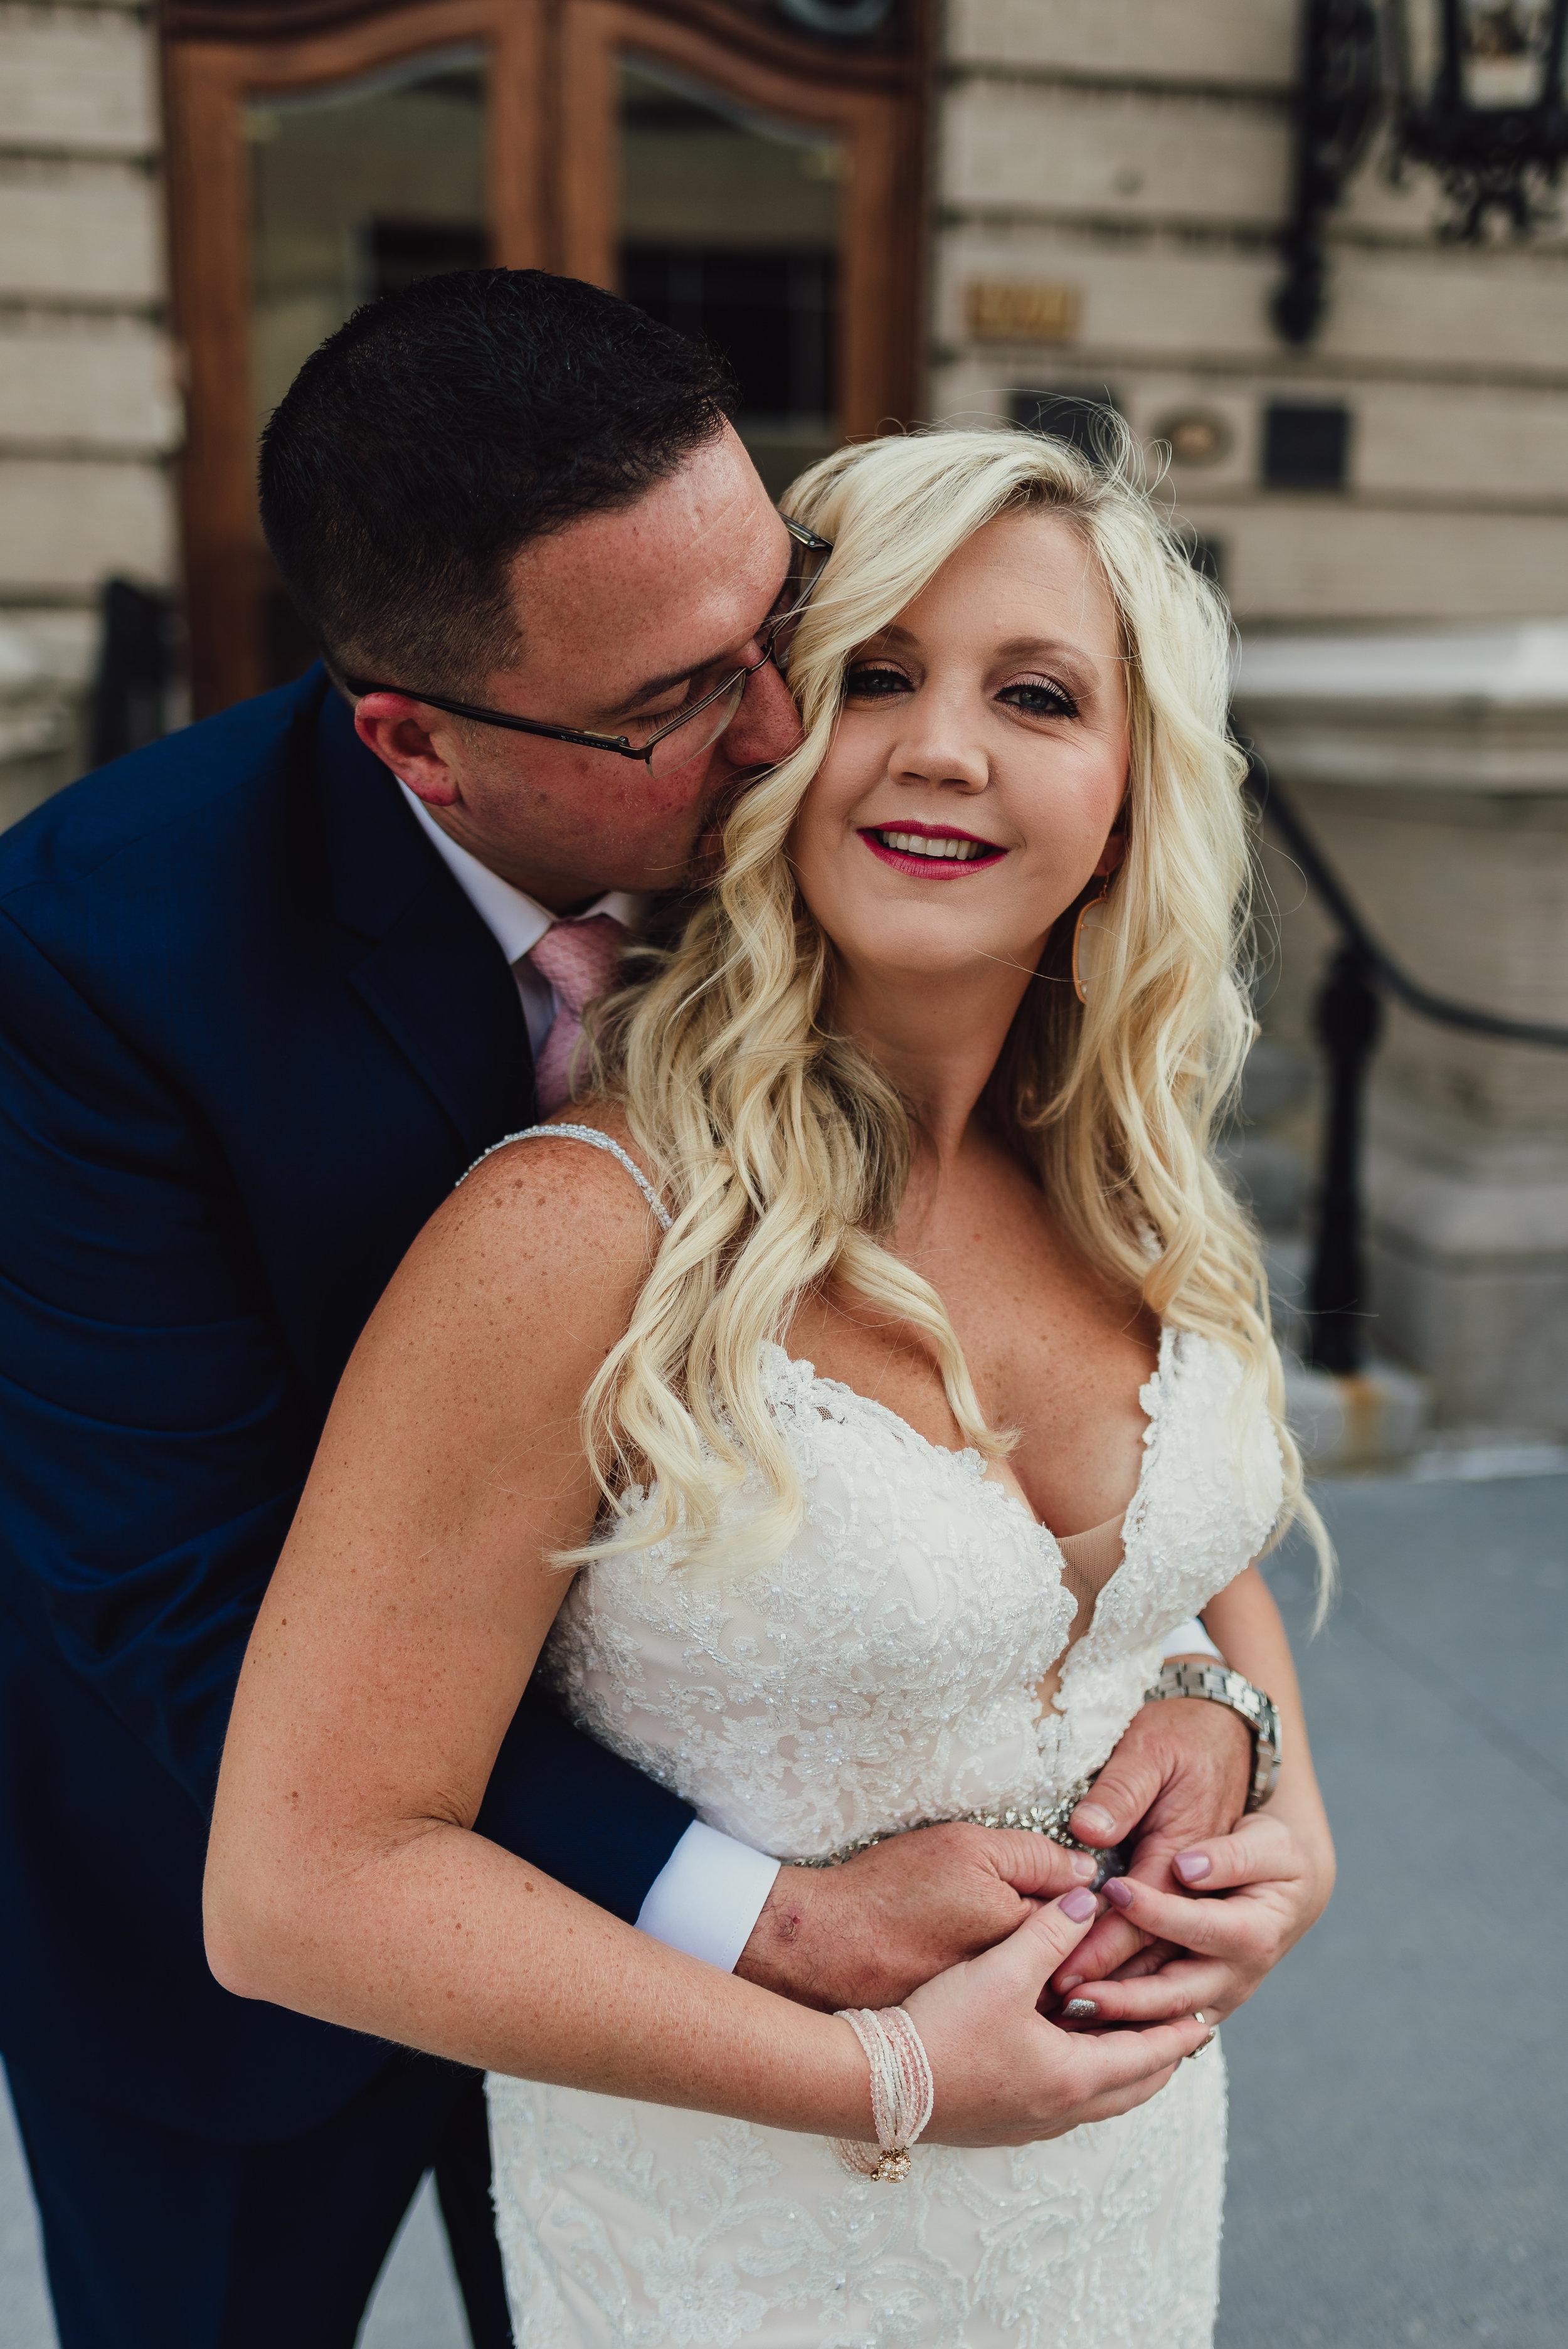 east-tn-wedding-photographer-tennessee-elopement-photographer-kingsport-tn-wedding-photographer (268 of 1001).jpg